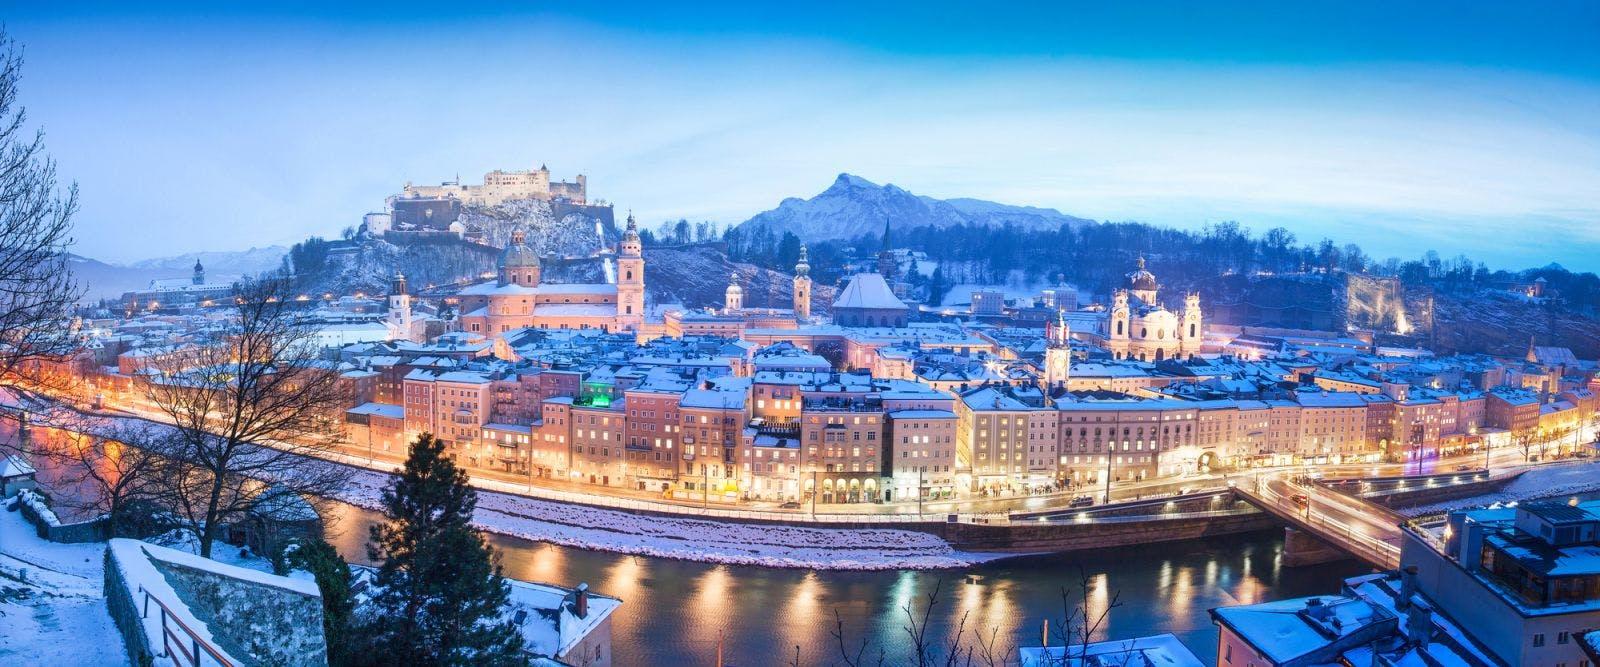 Picture of Salzburg